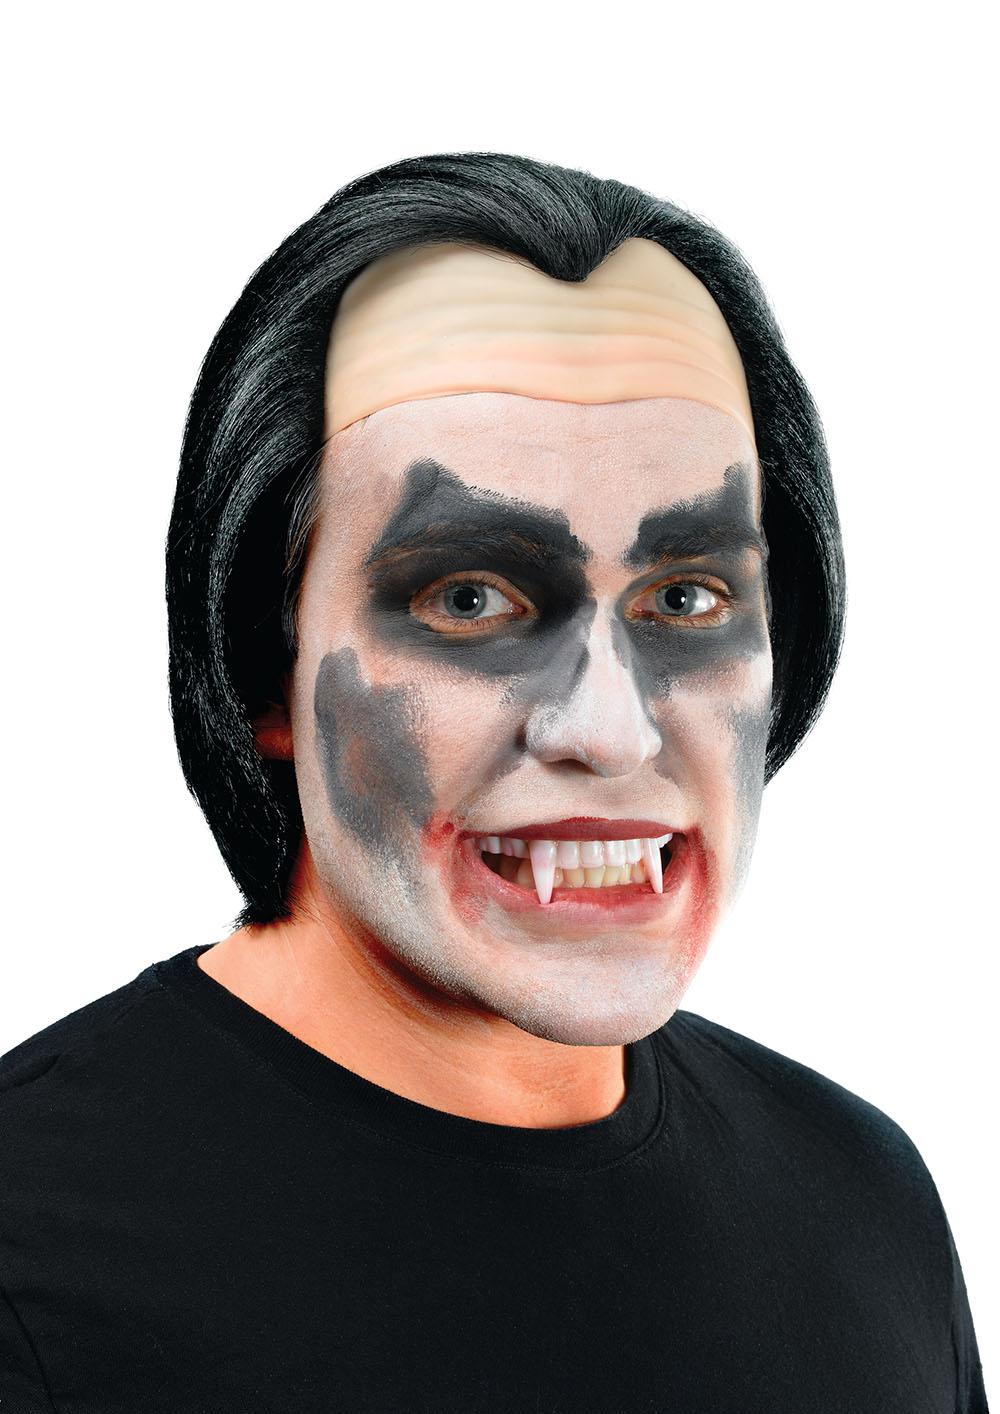 Макияж на хэллоуин фото мальчики